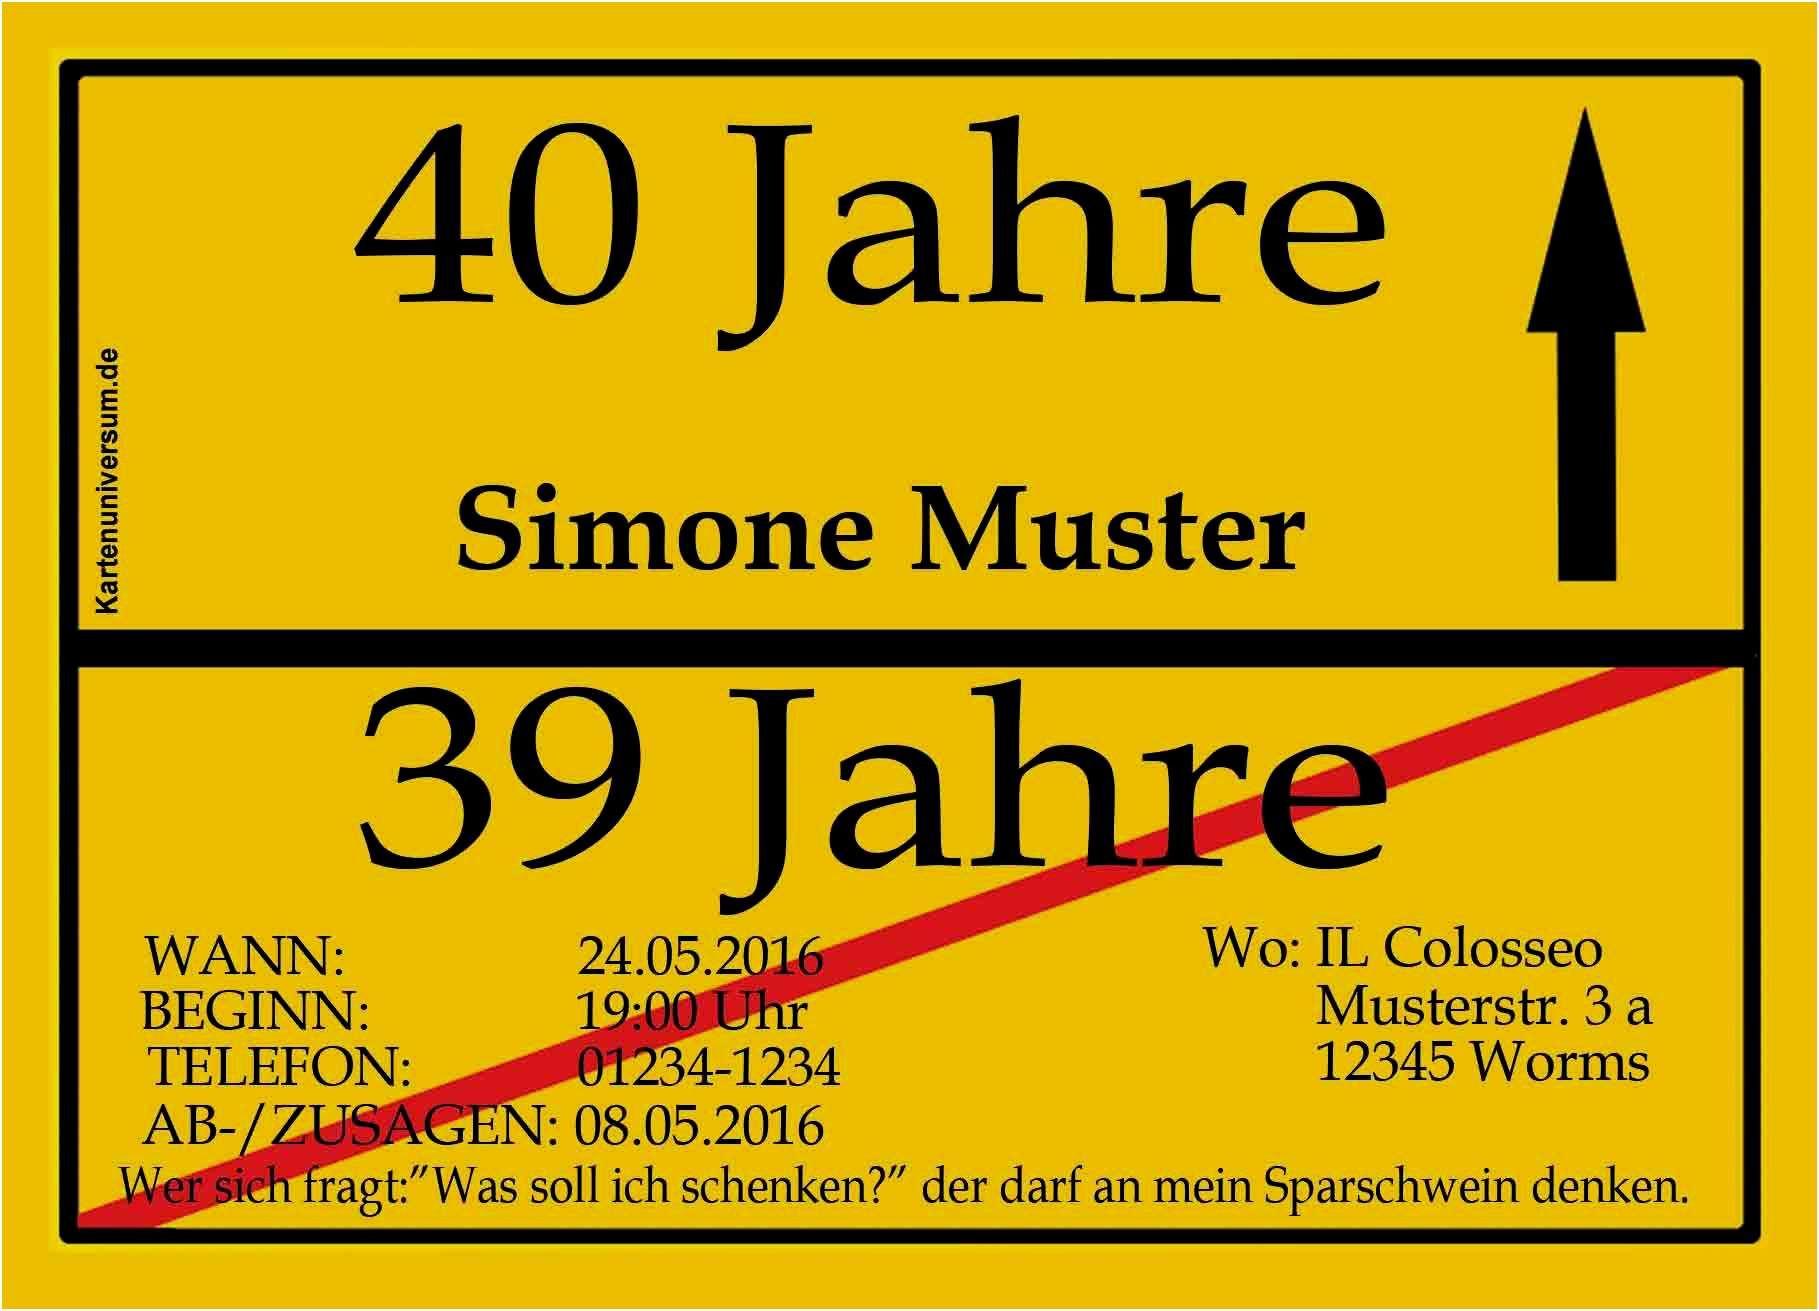 Zitate Zum 70. Geburtstag  Zitate Zum 70 Geburtstag